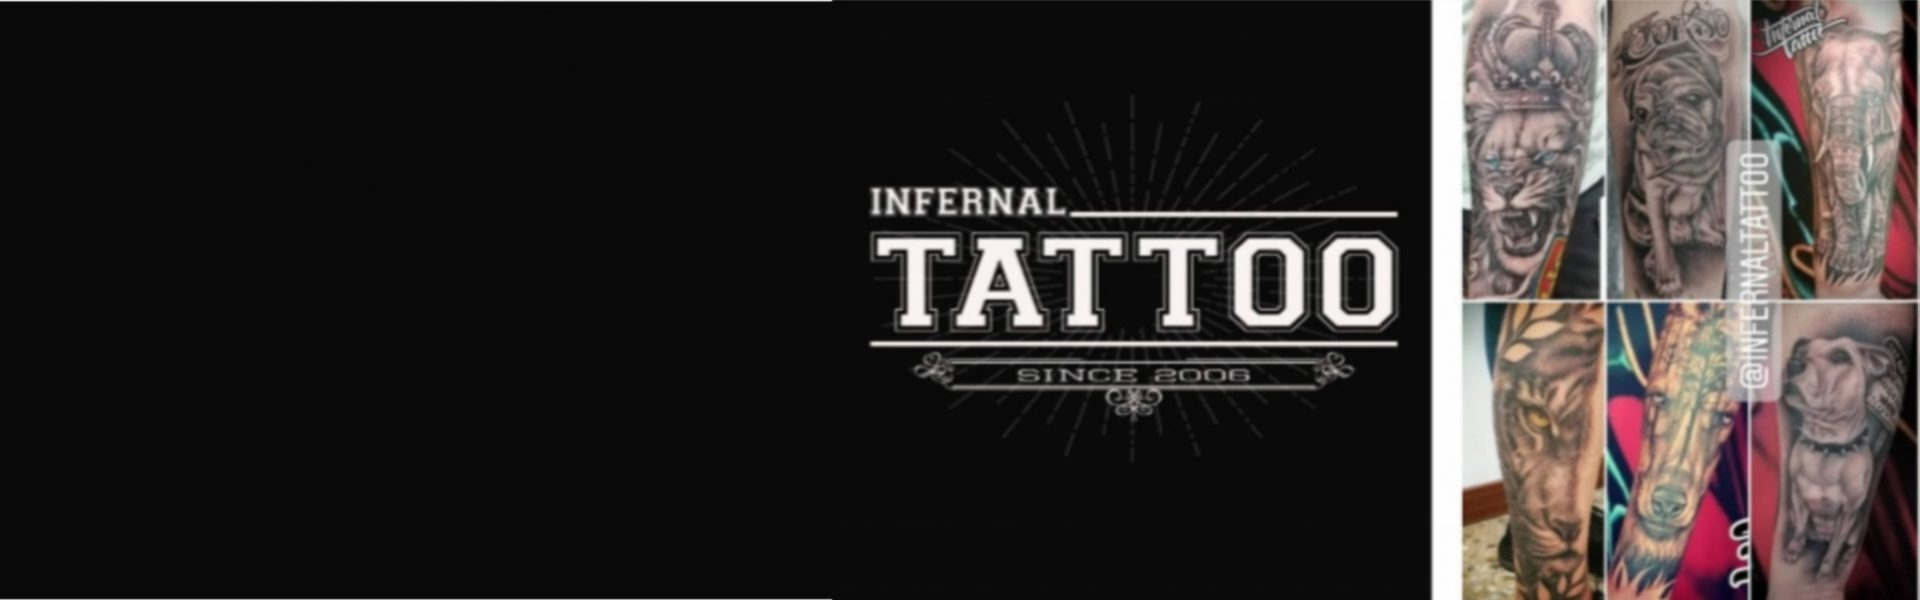 Infernal TATTOO